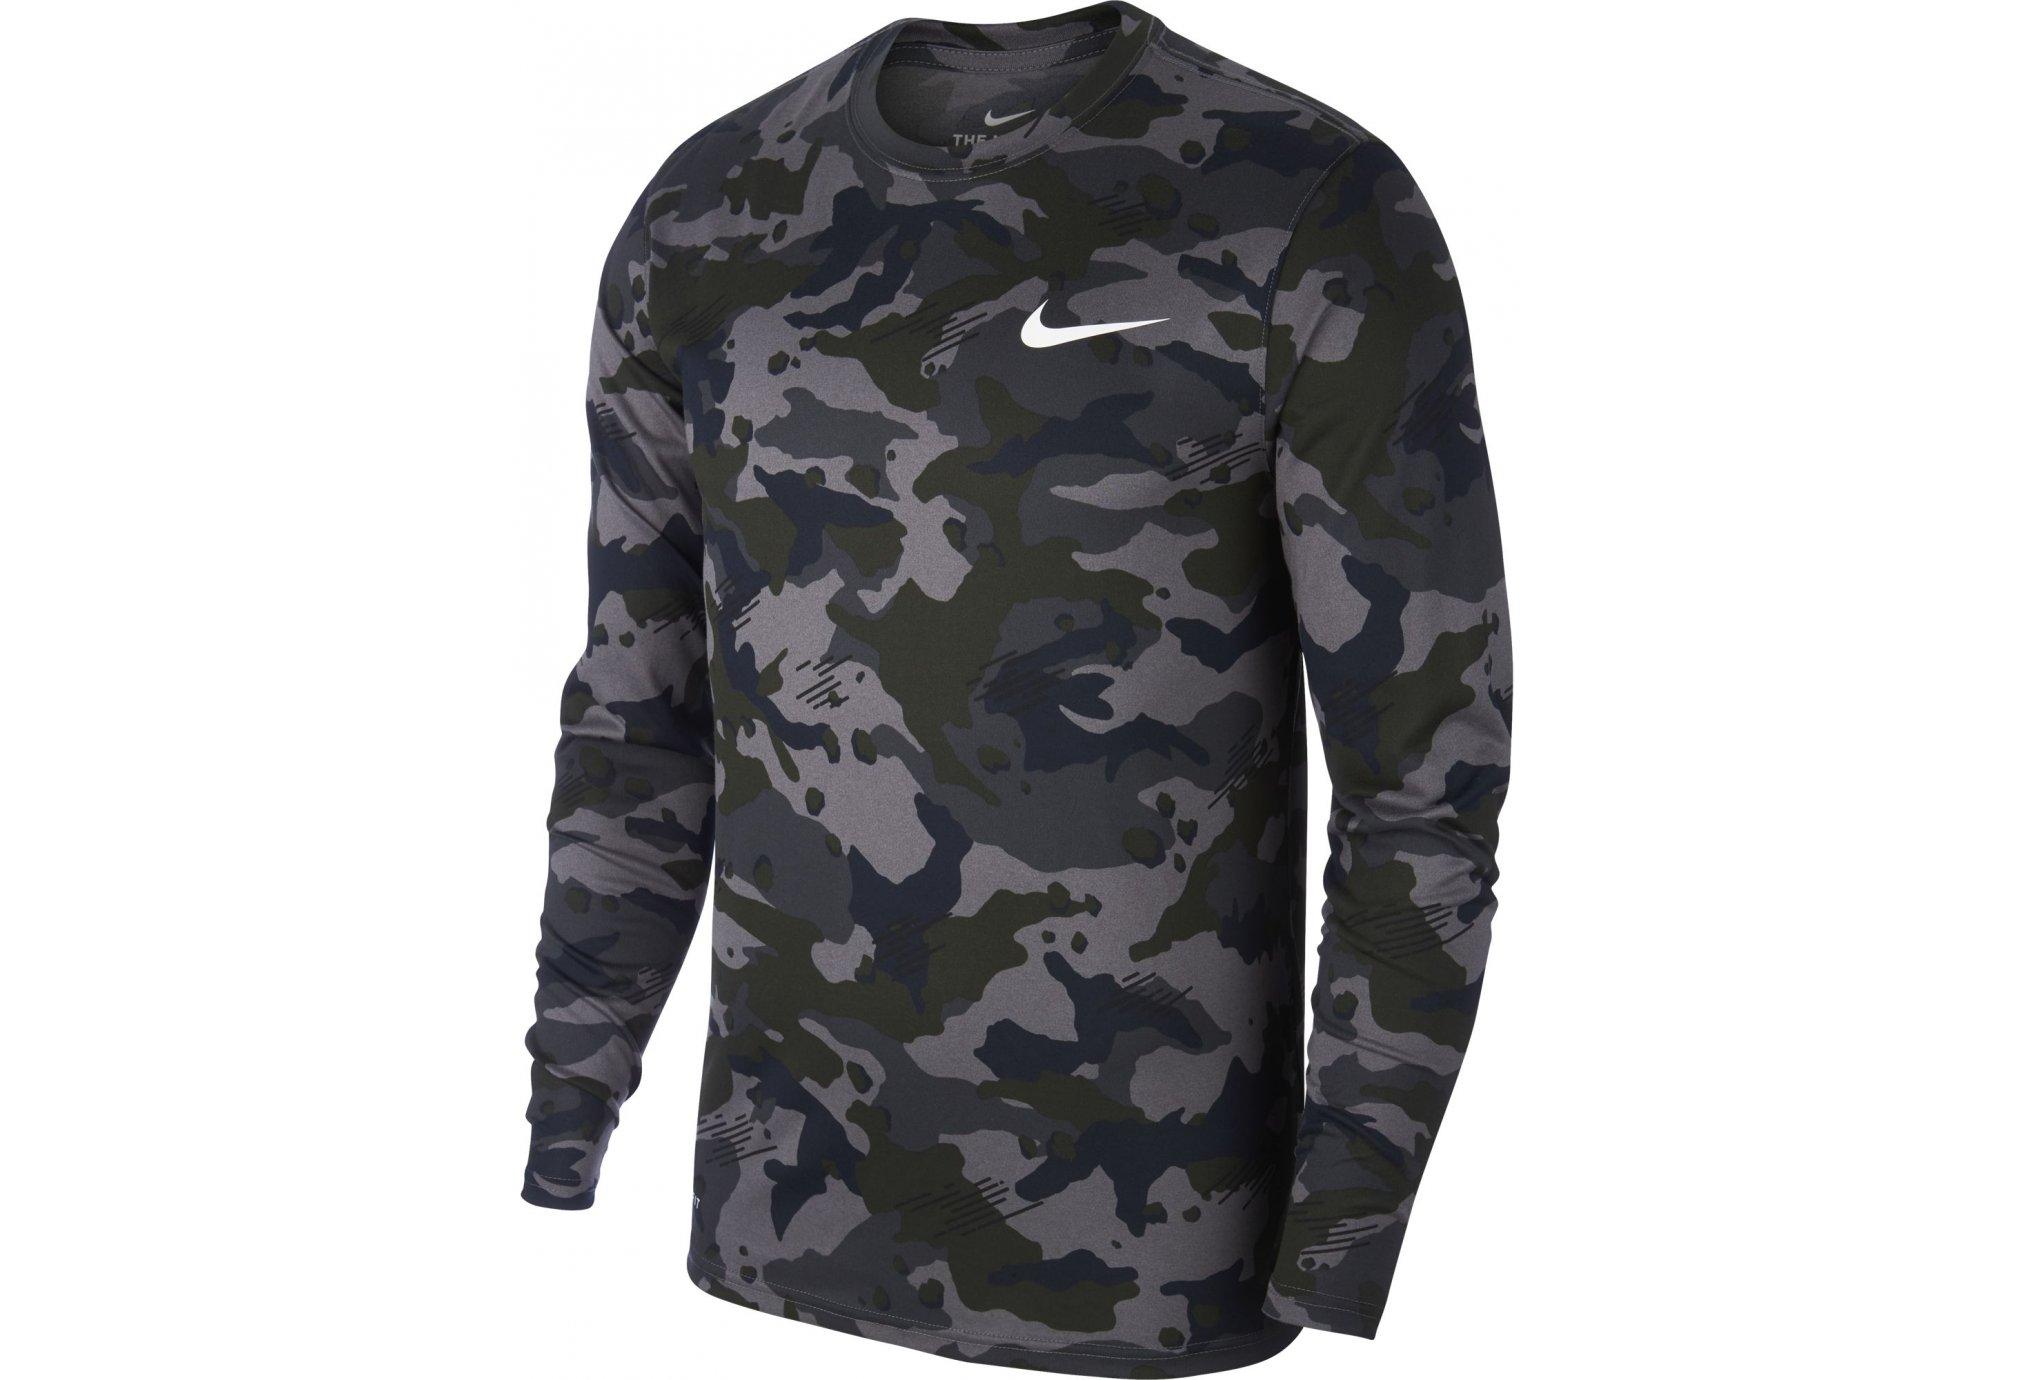 grossiste e0c10 469dc SILBER TOUR - Nike Dri-Fit Legend M vêtement running homme